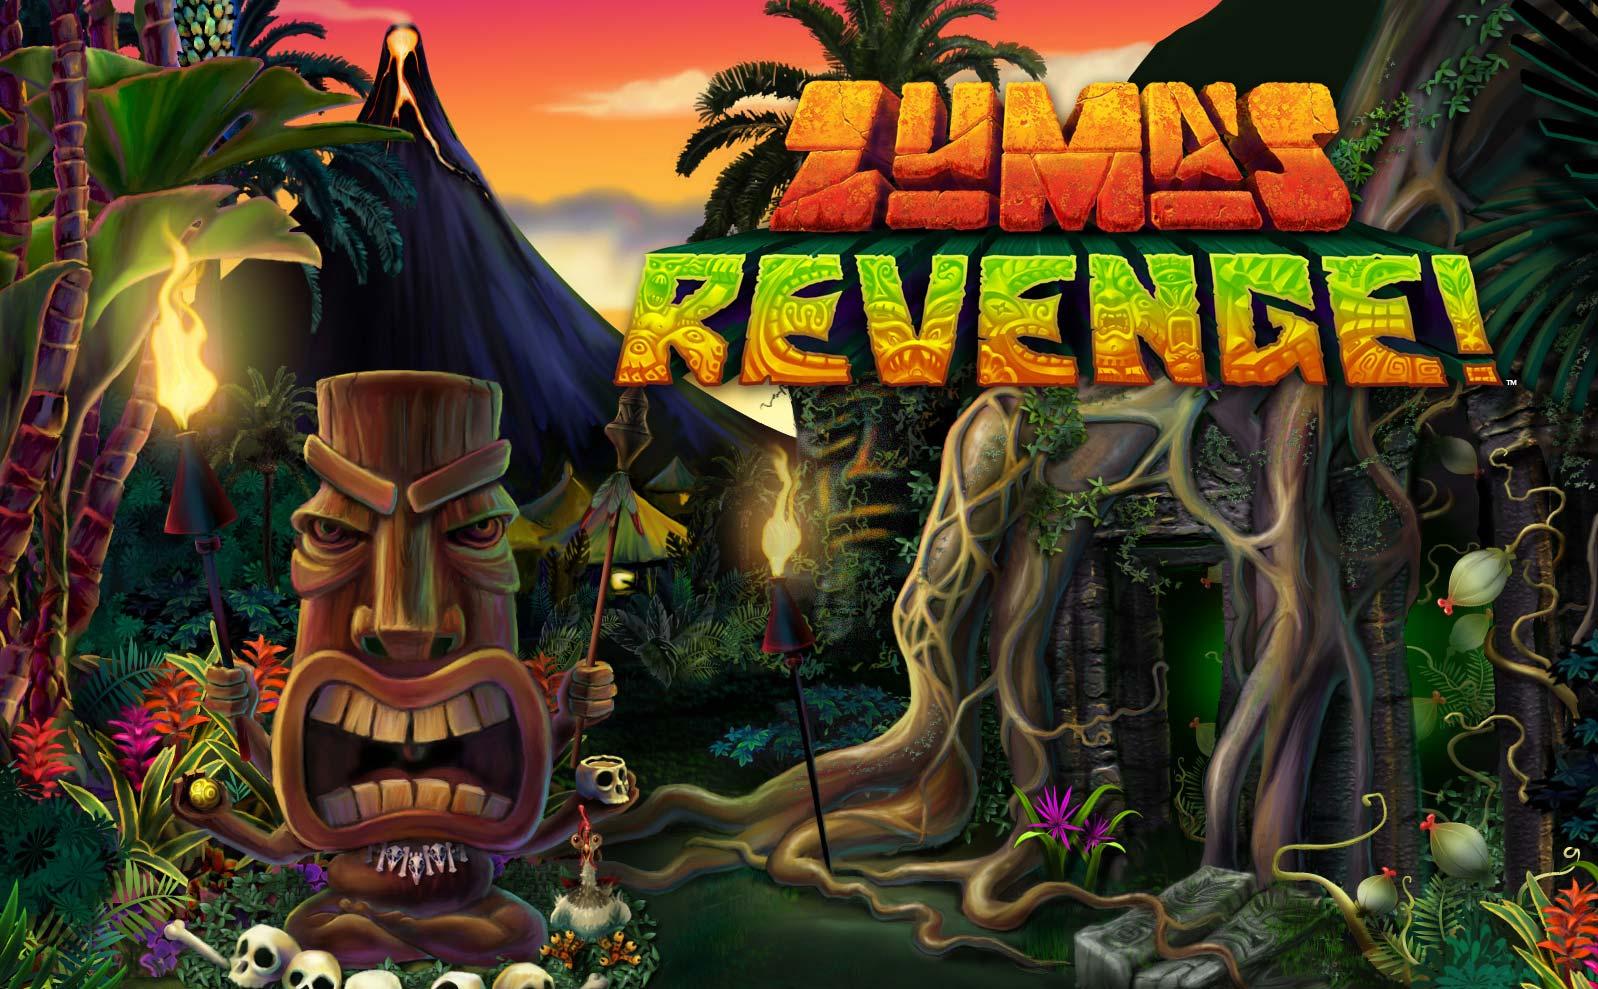 zumas-revenge-title-screen-screenshot.jpg